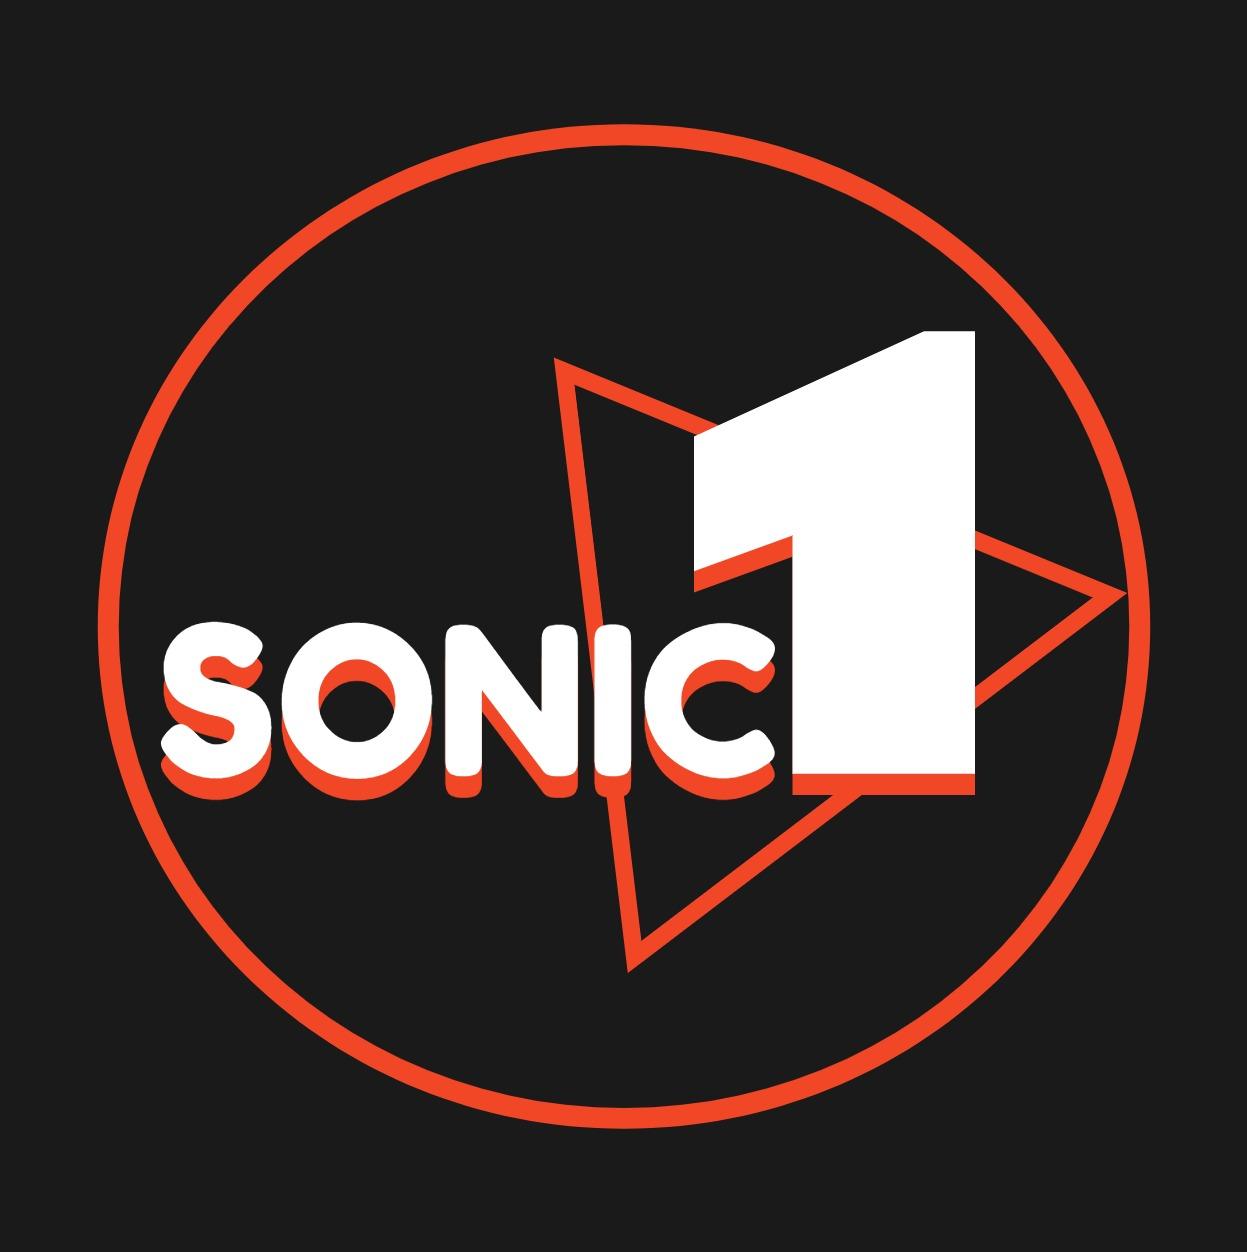 Sonic 1 (Los Angeles) logo